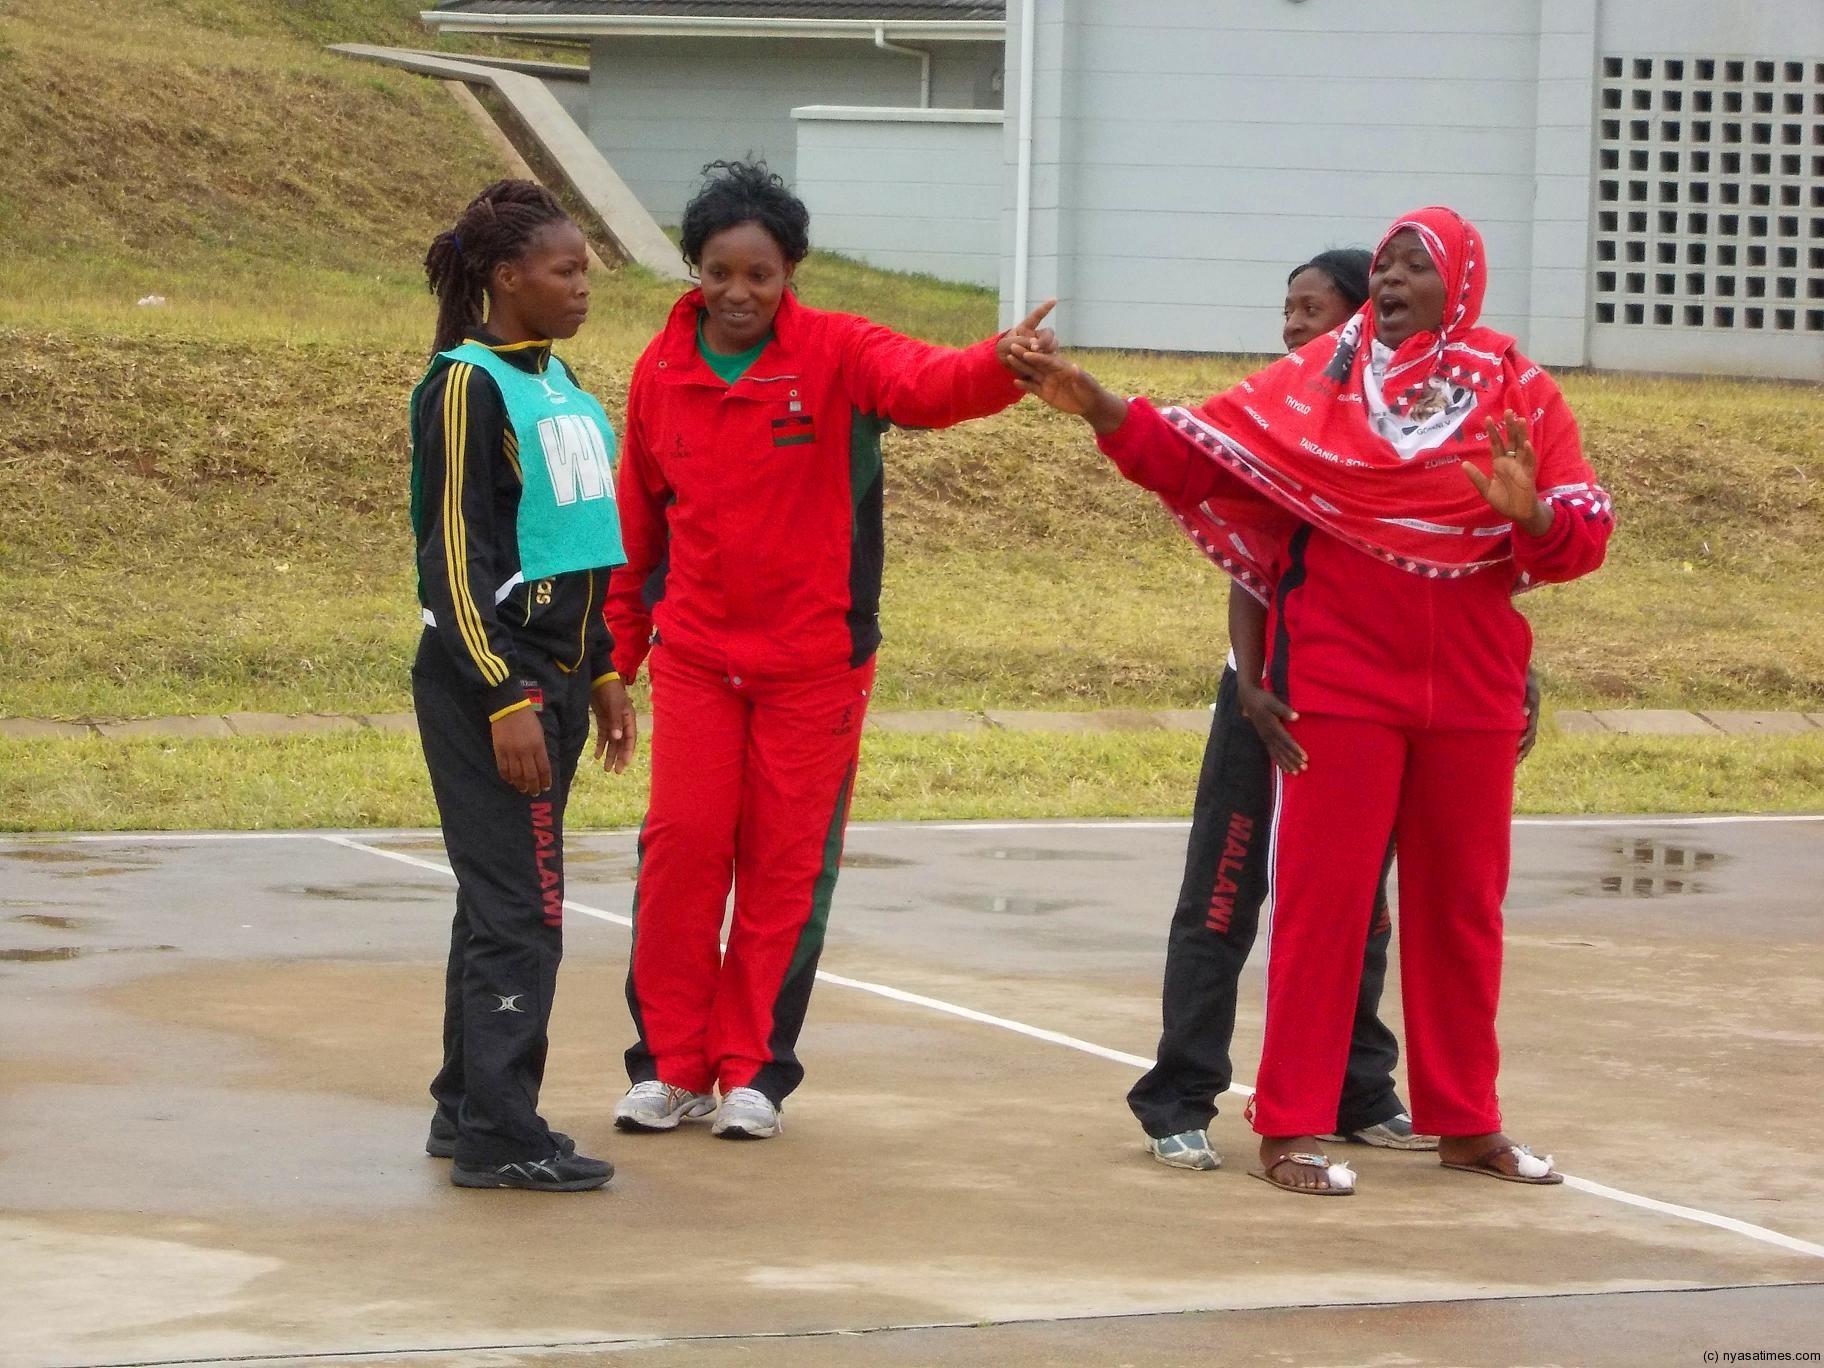 malawi chairs johannesburg folding papasan chair target nam sticks with peace as queens coach waya demoted